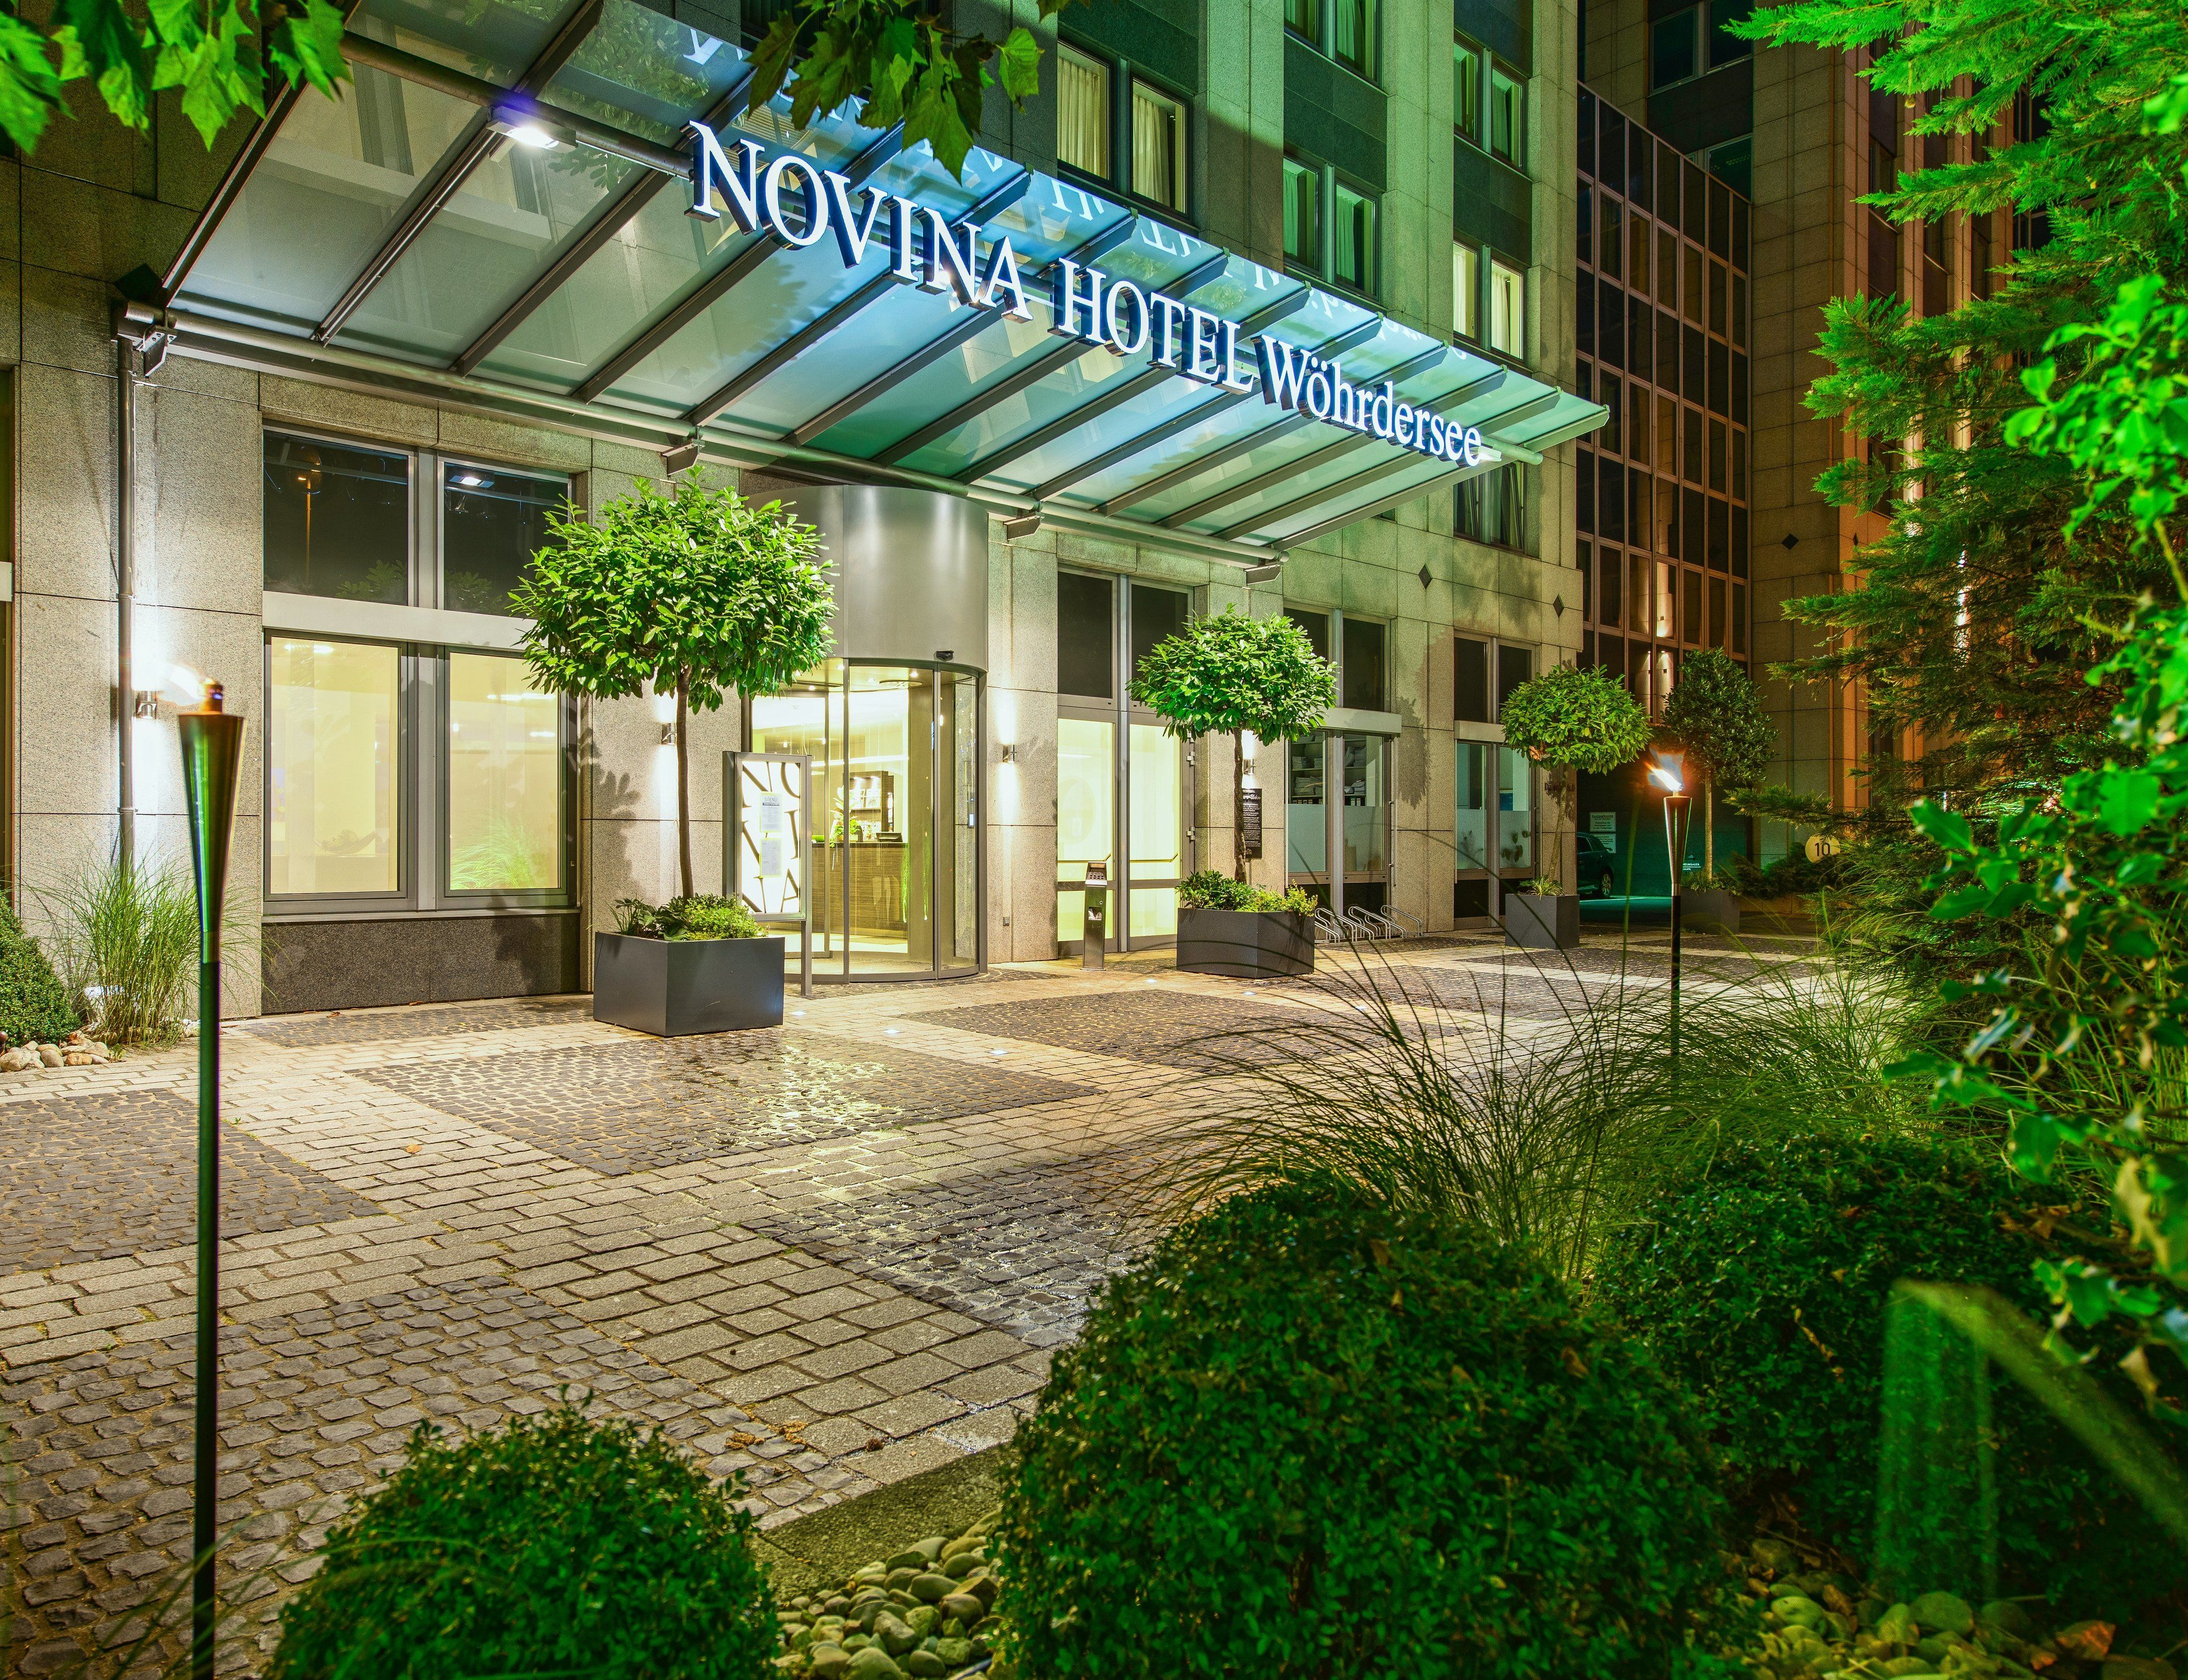 NOVINA HOTEL Wöhrdersee